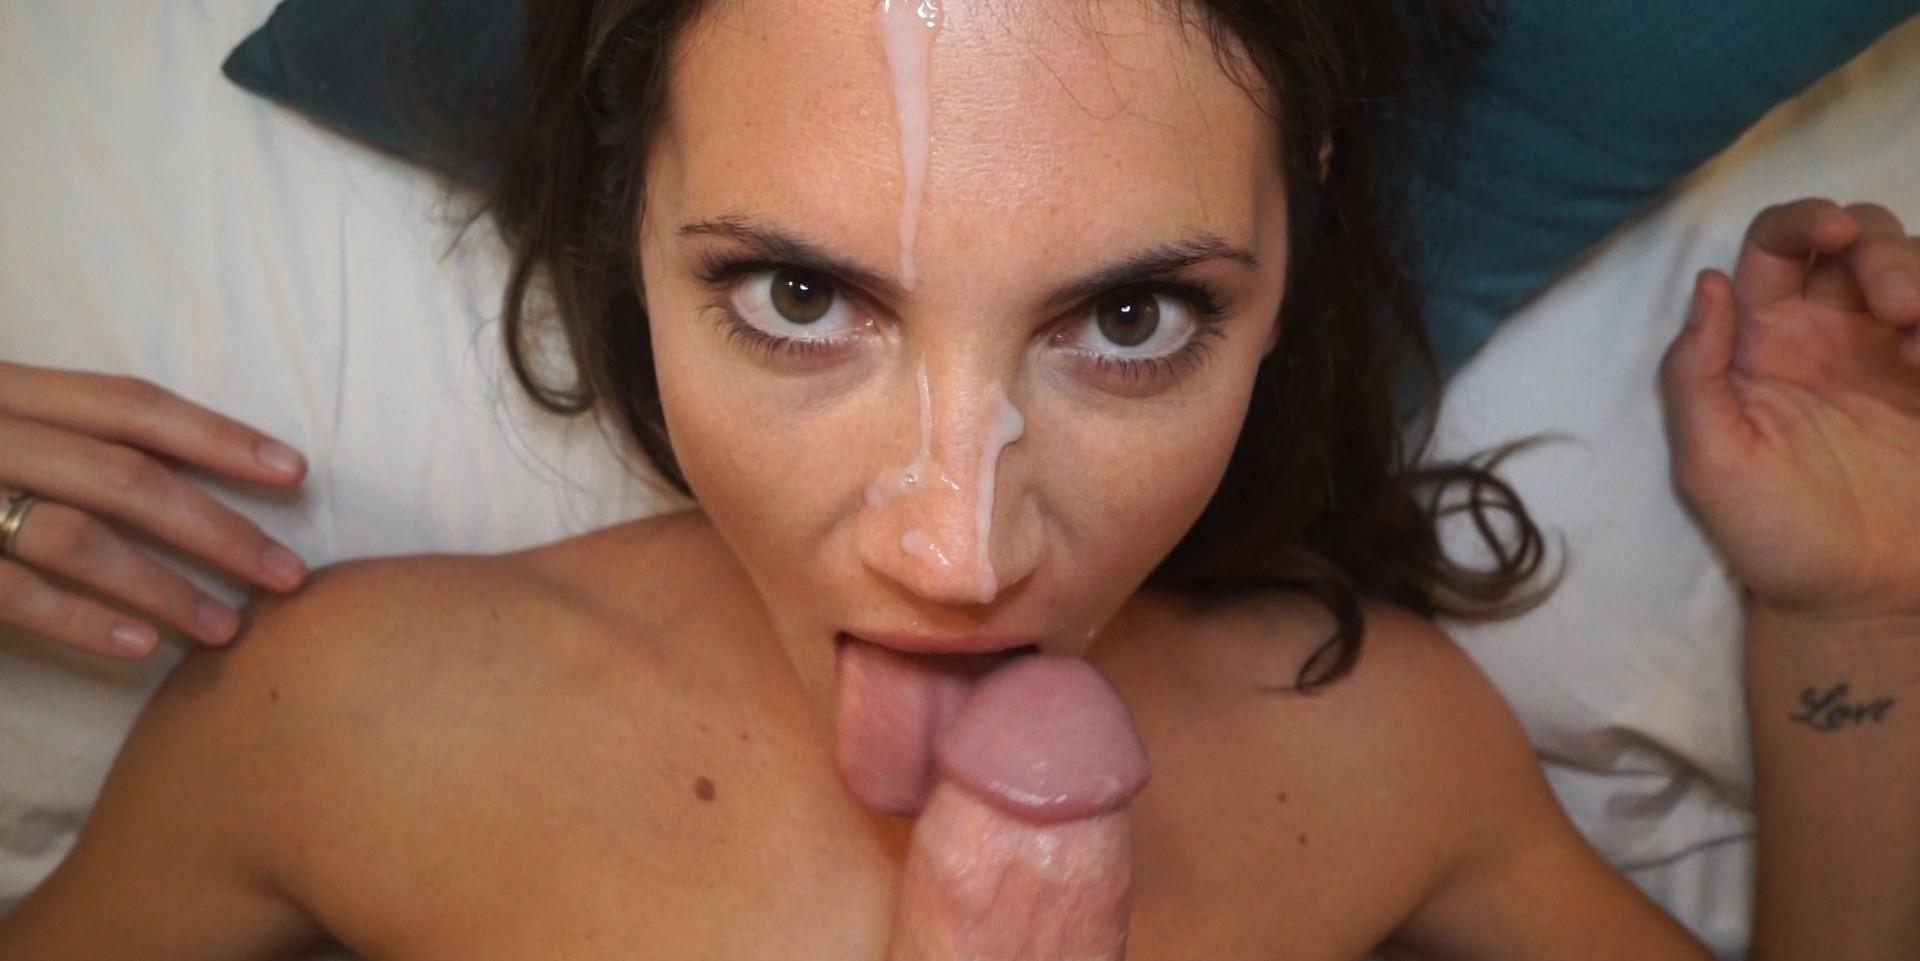 Hot girl getting cumshot